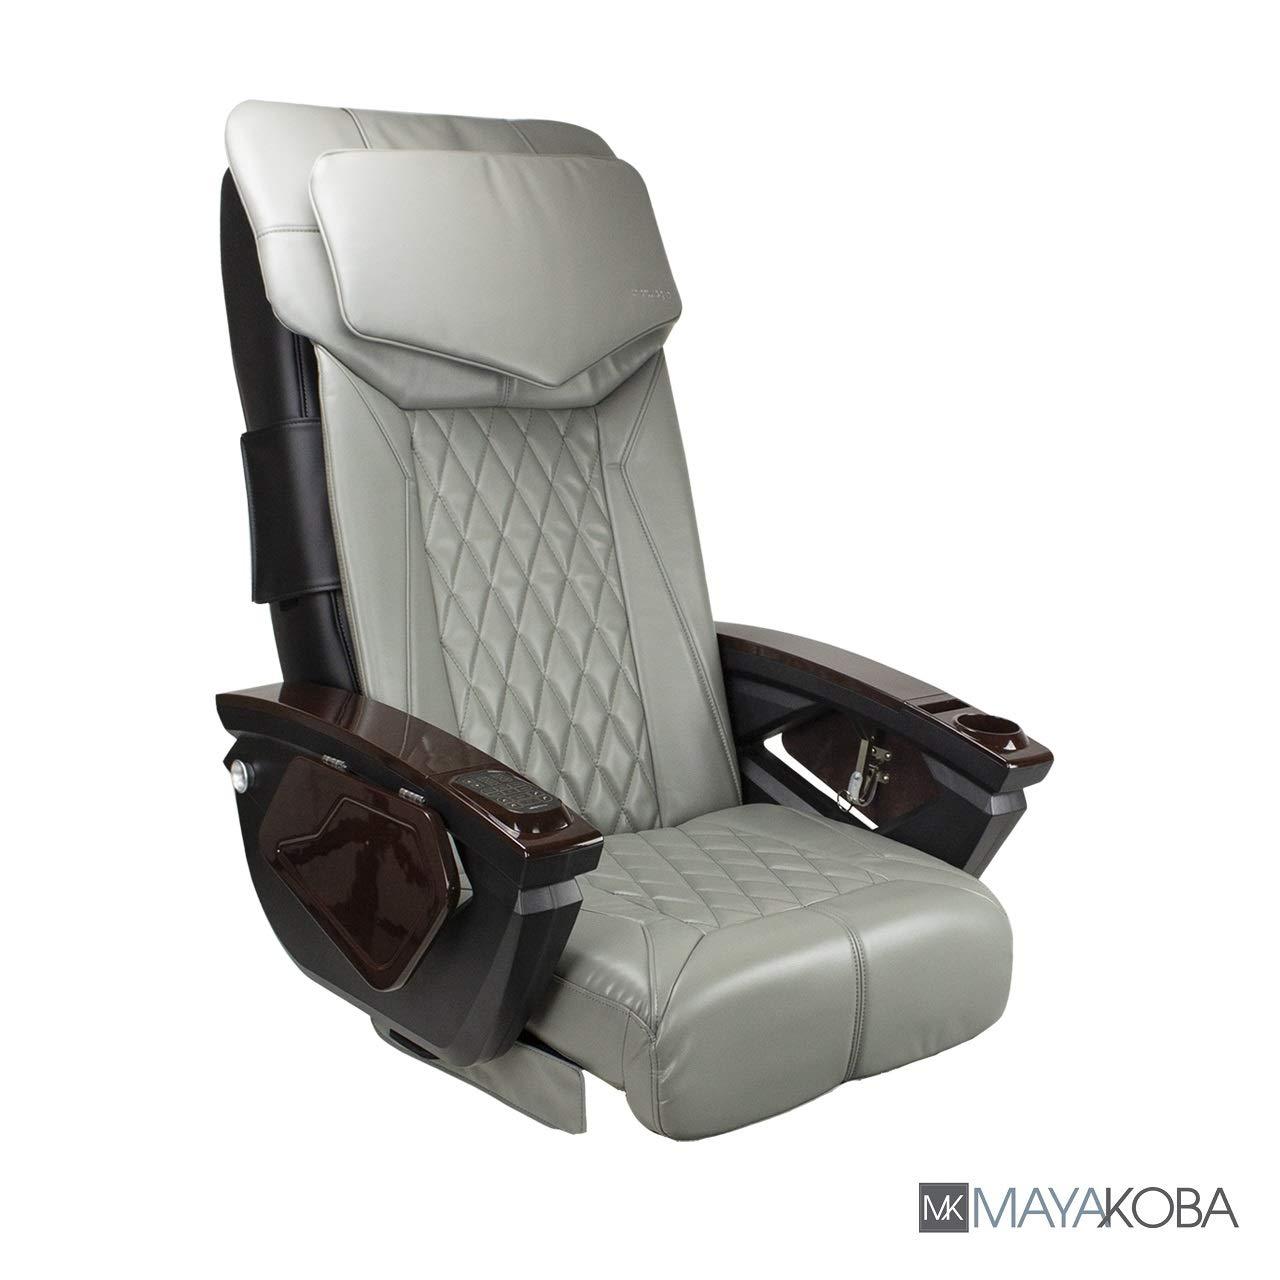 Shiatsulogic Pedicure Chair Cushion Cover Set for Nail Salon Pedicure Furniture, Luxurious & Modern, Tufted Design, Storm Grey